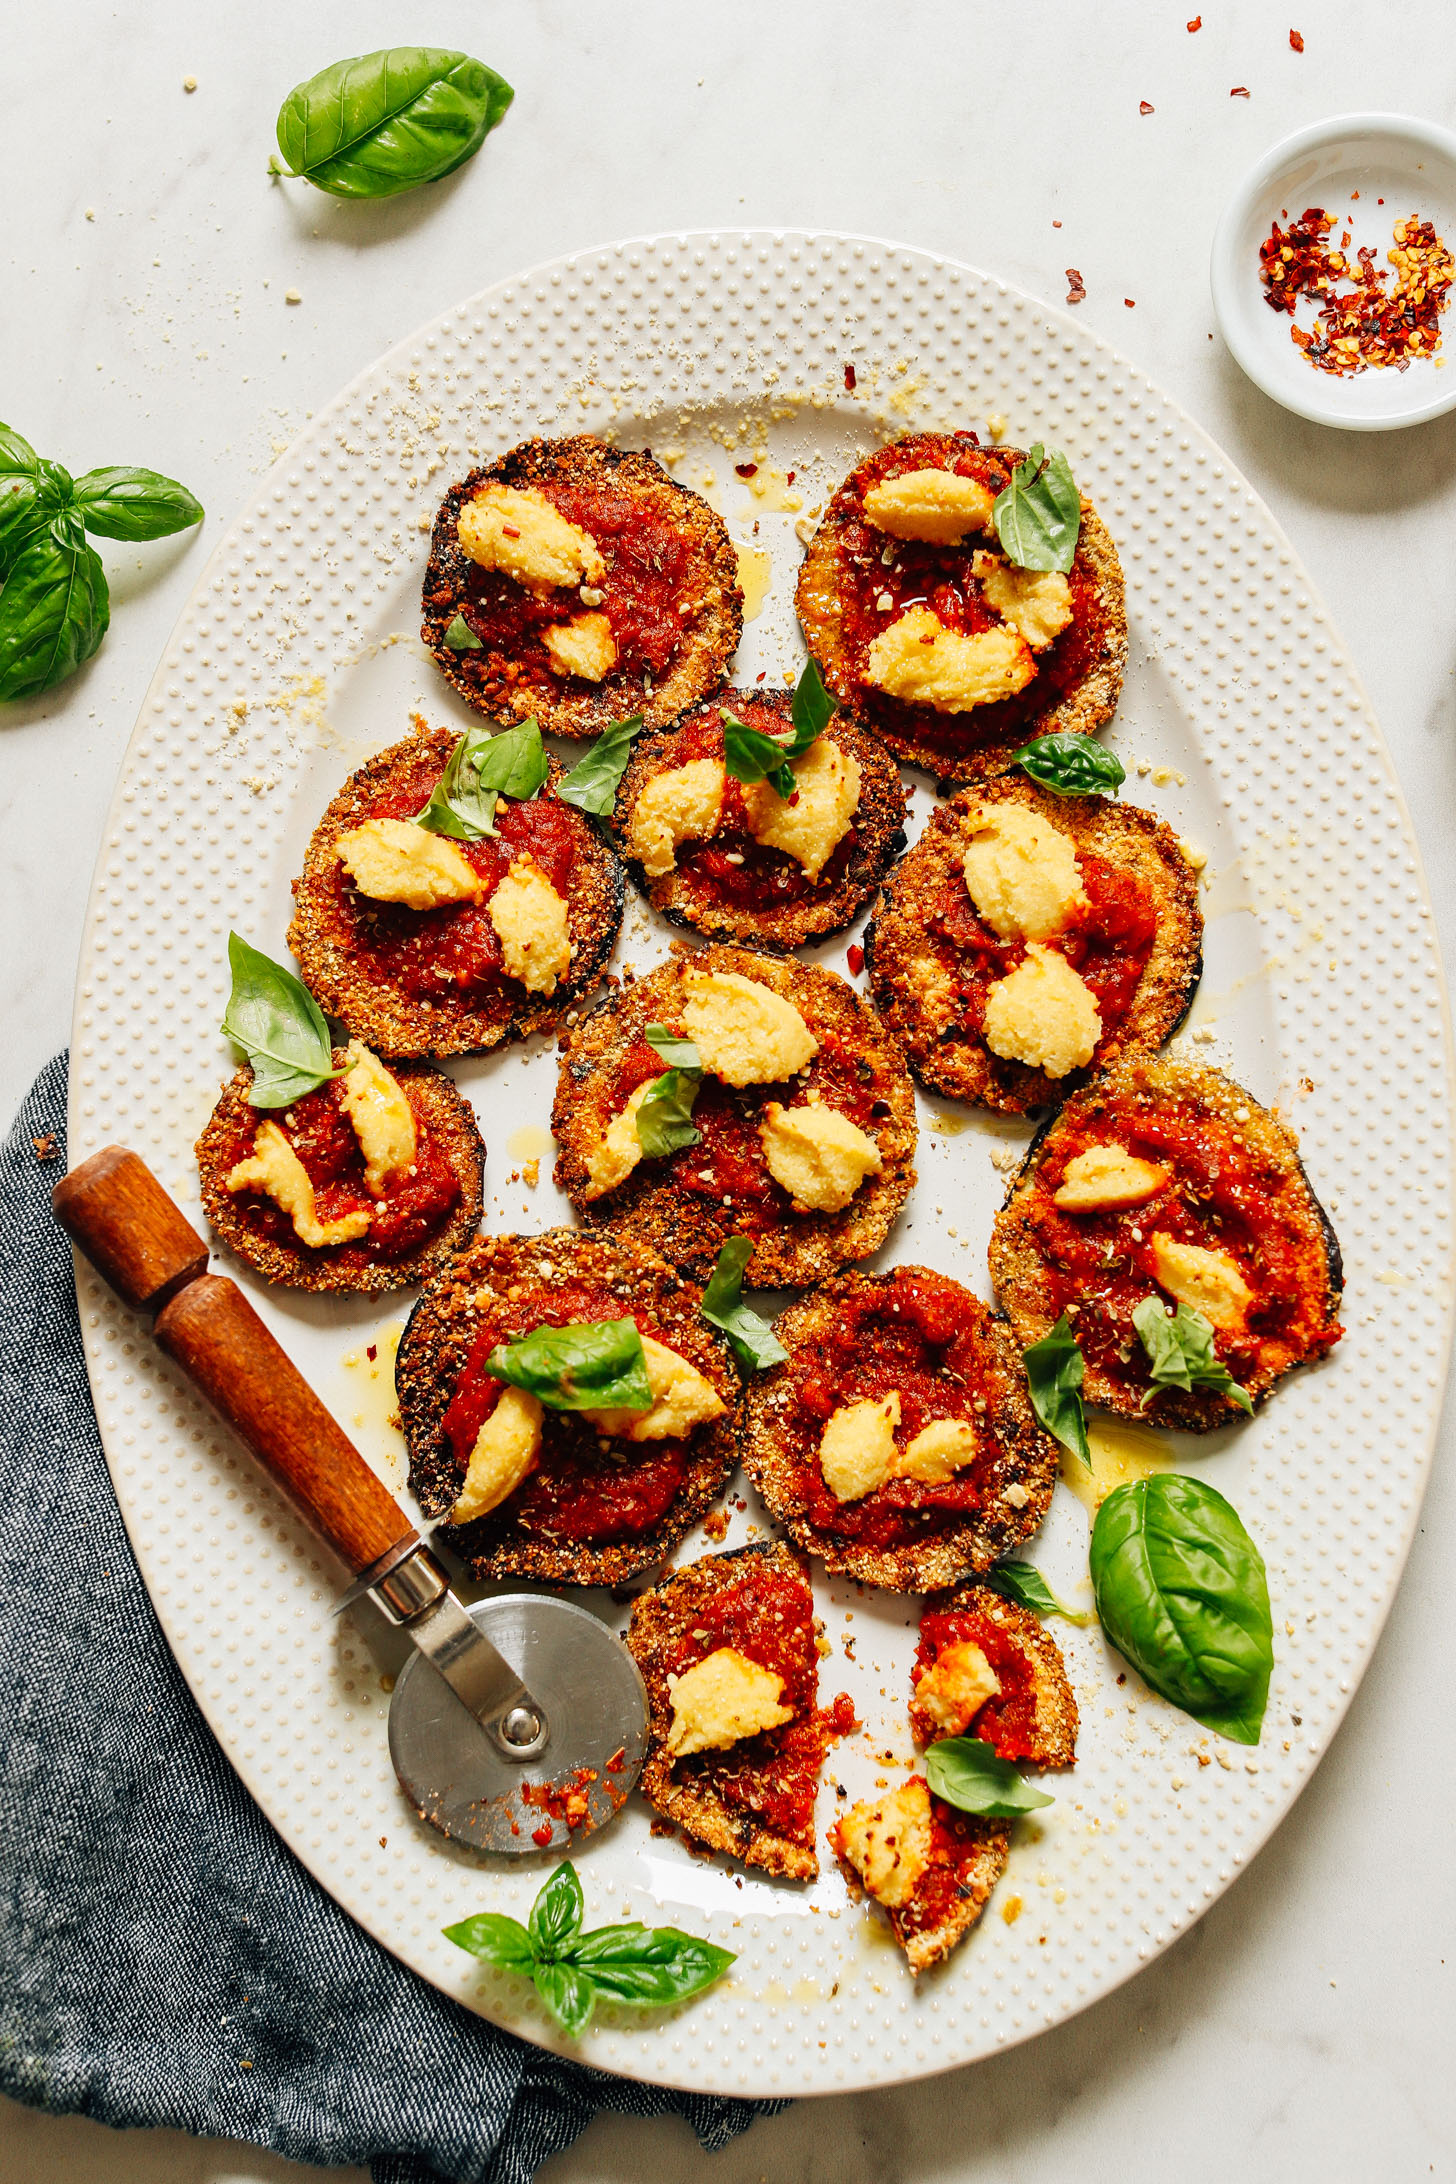 Platter filled with crispy vegan Mini Eggplant Pizzas